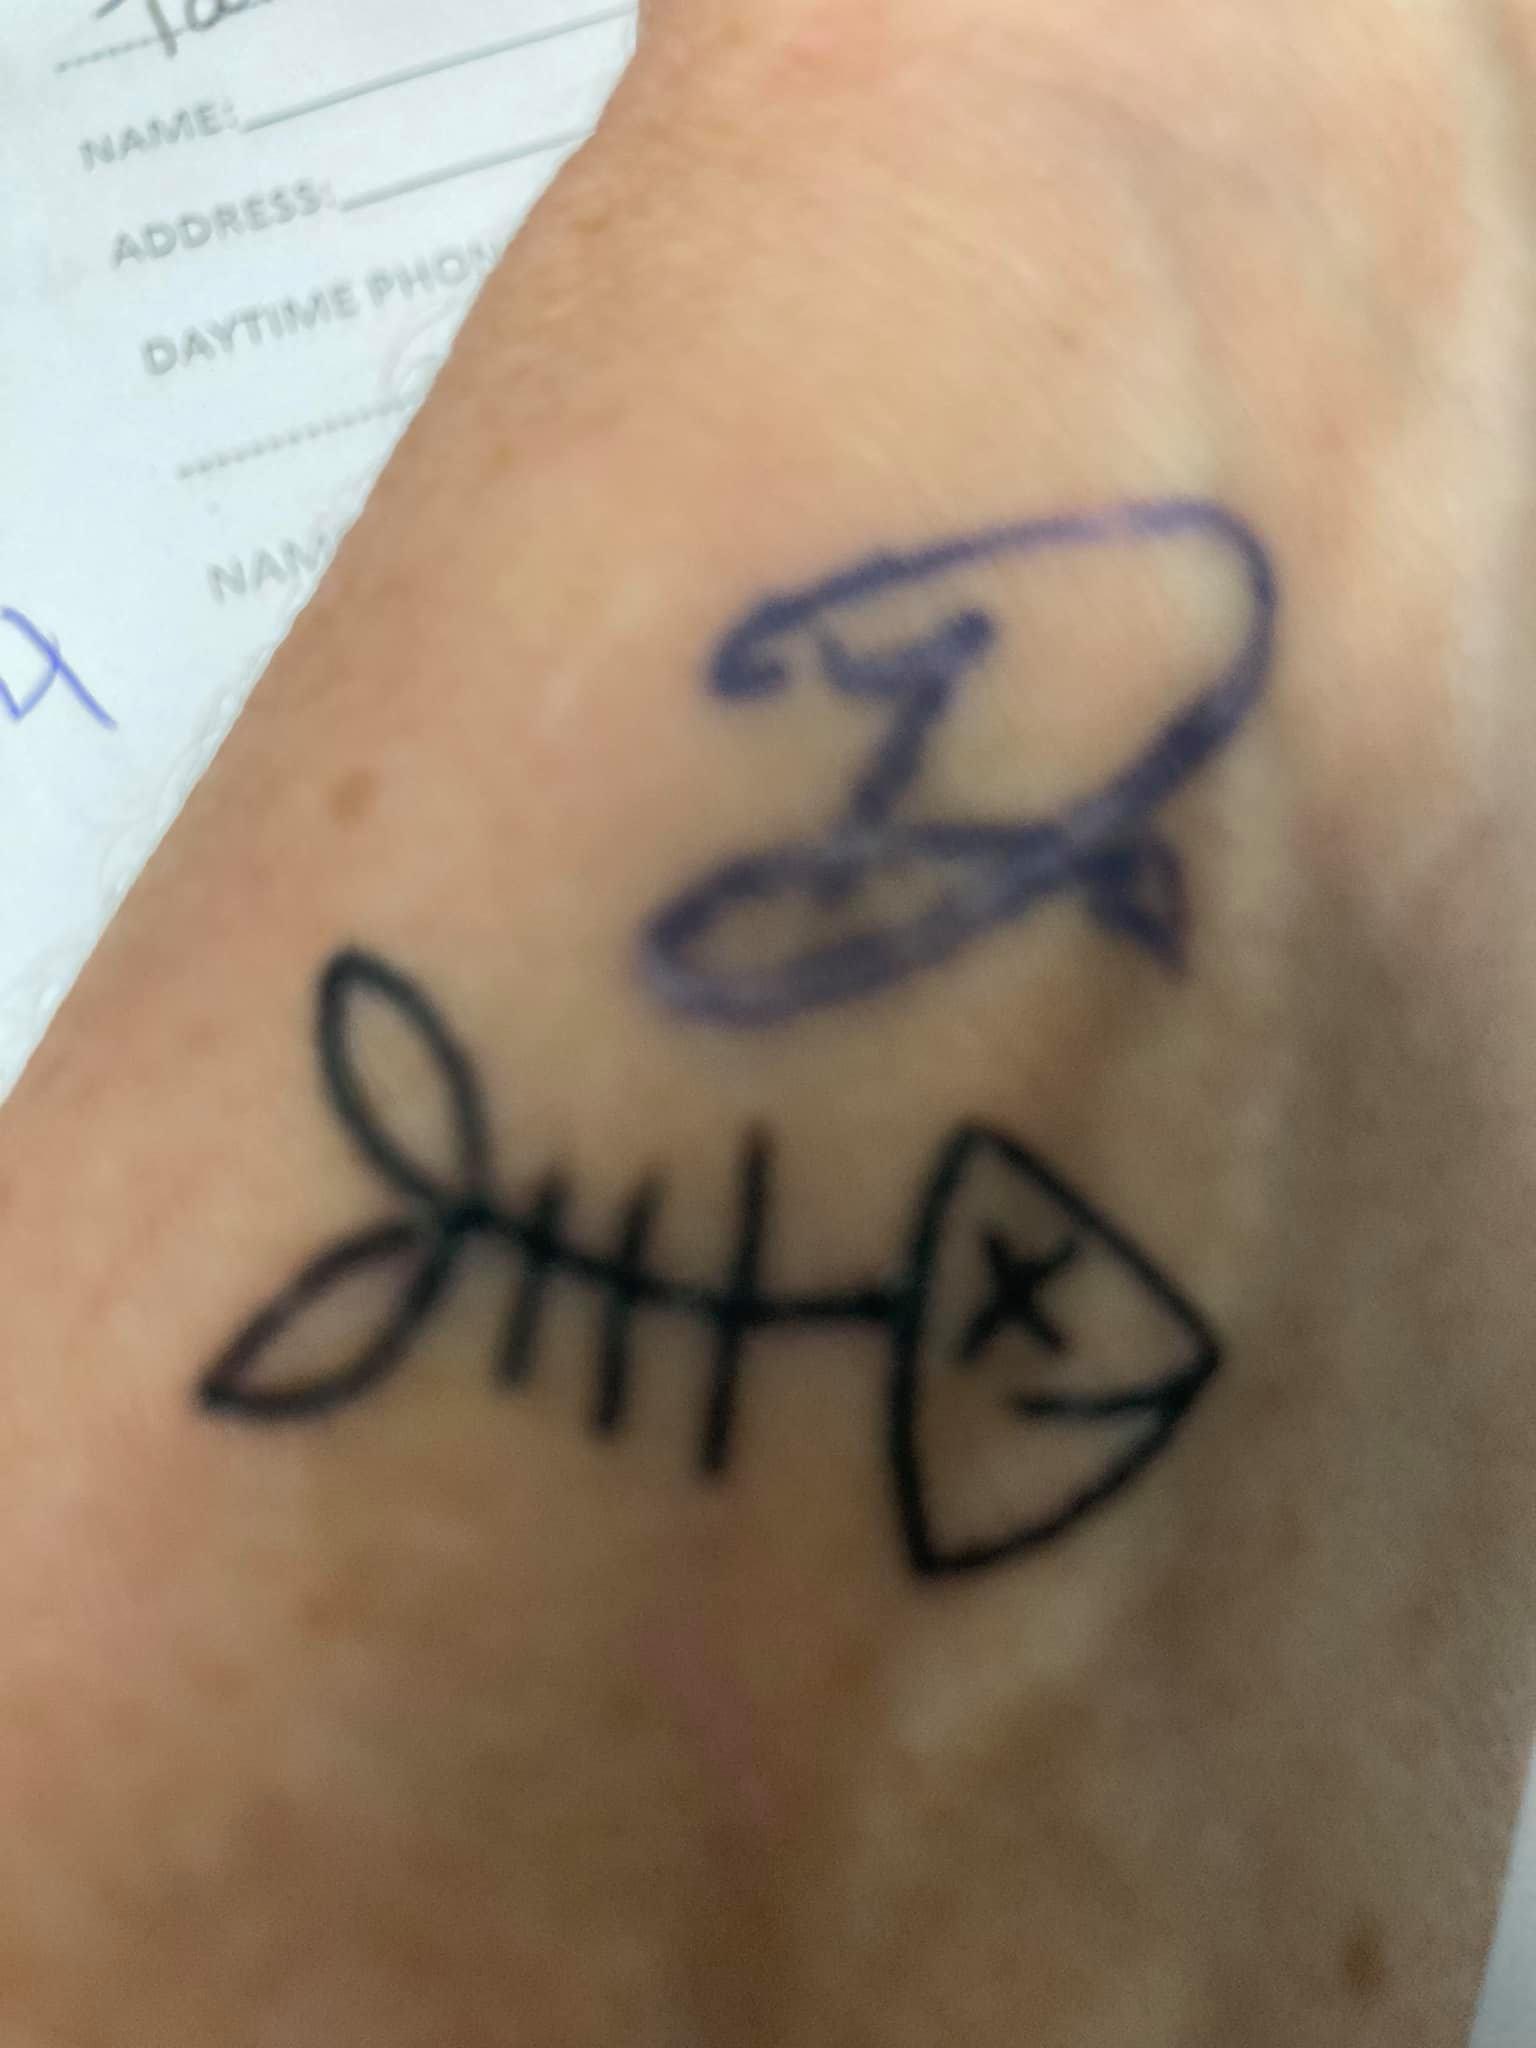 I Got My Tattoo @ Skin Elixer's Breast Cancer Awareness Event!